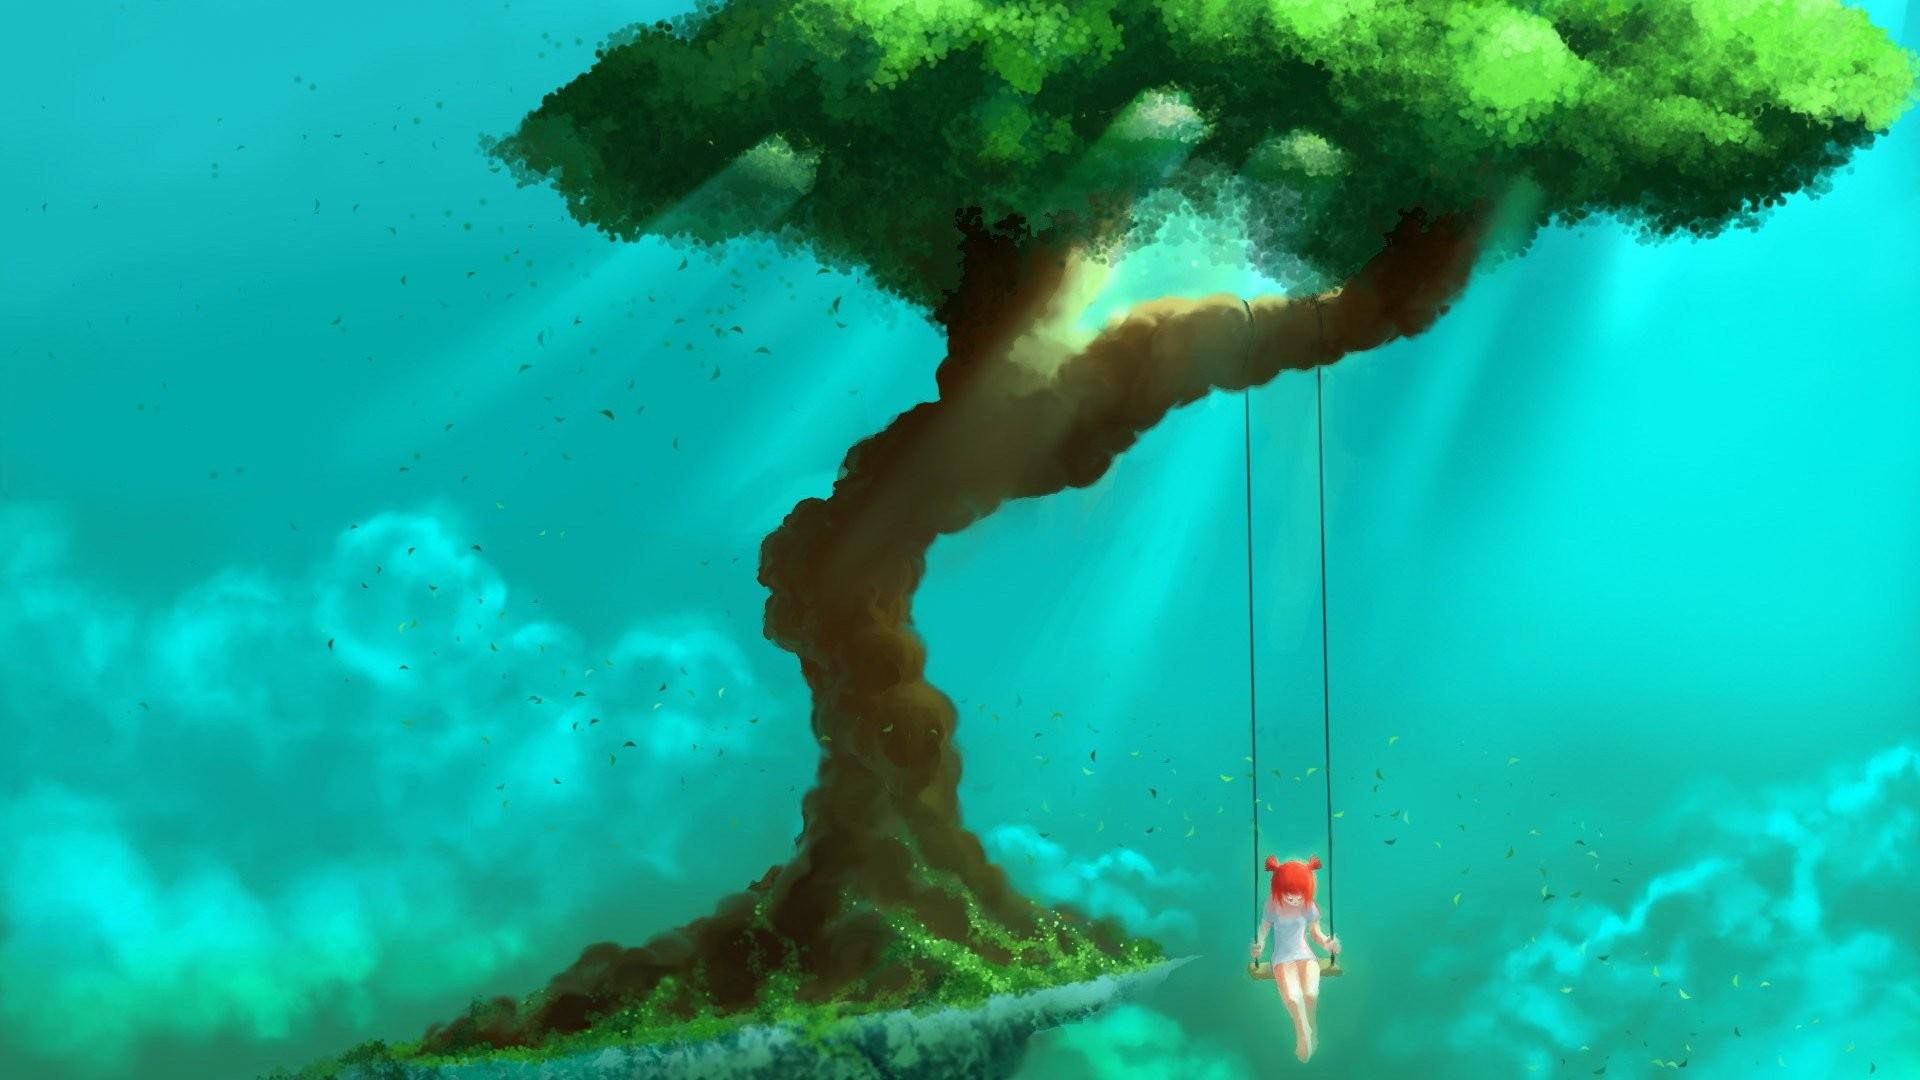 General 1920x1080 fantasy art trees children swings sky nature redhead artwork turquoise